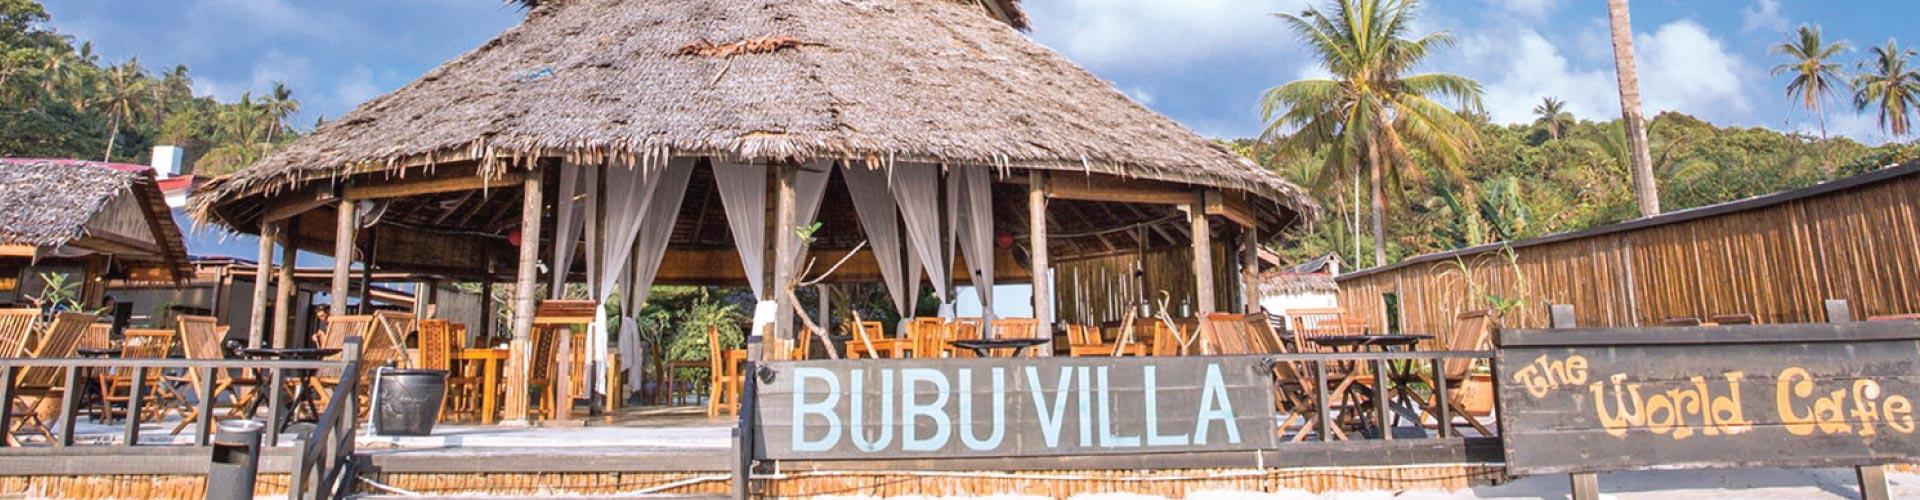 Perhentian Island Package @ Bubu Villa Resort